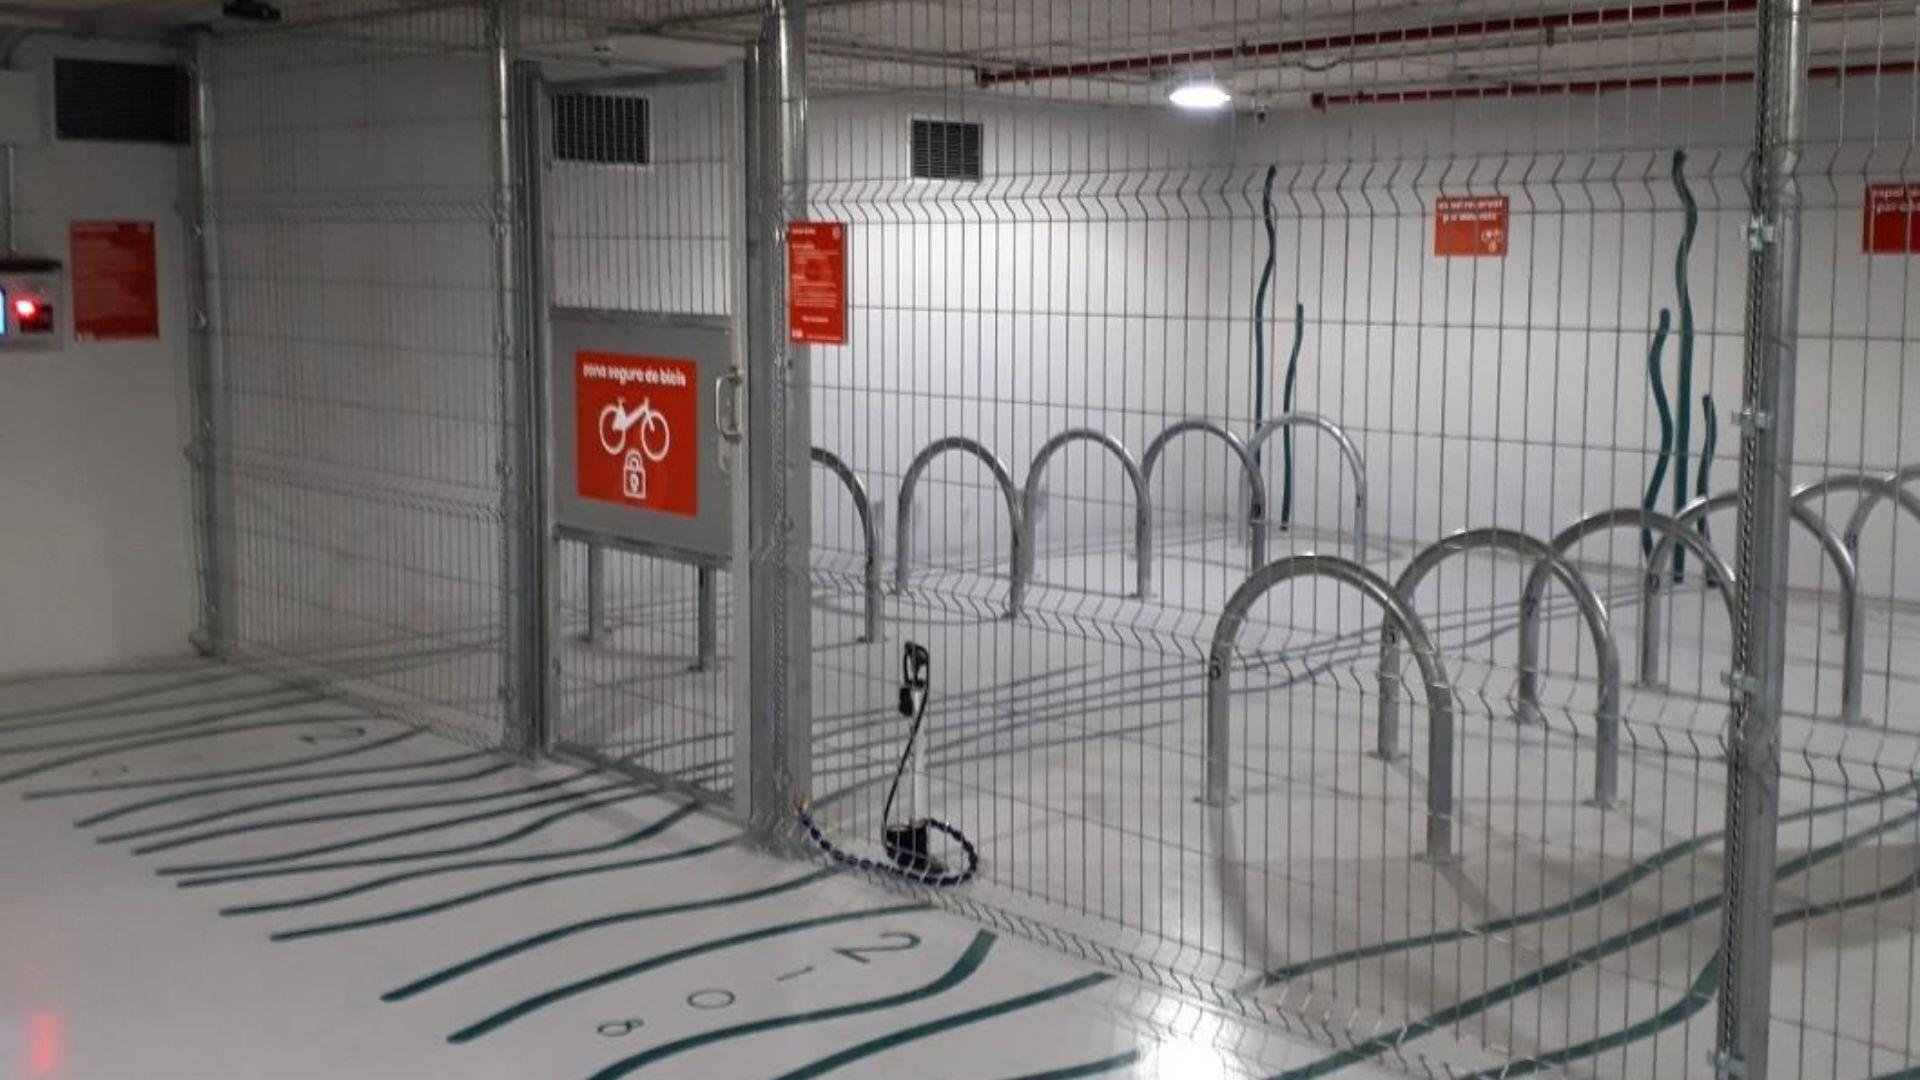 aparcament bicis mercat sant antoni